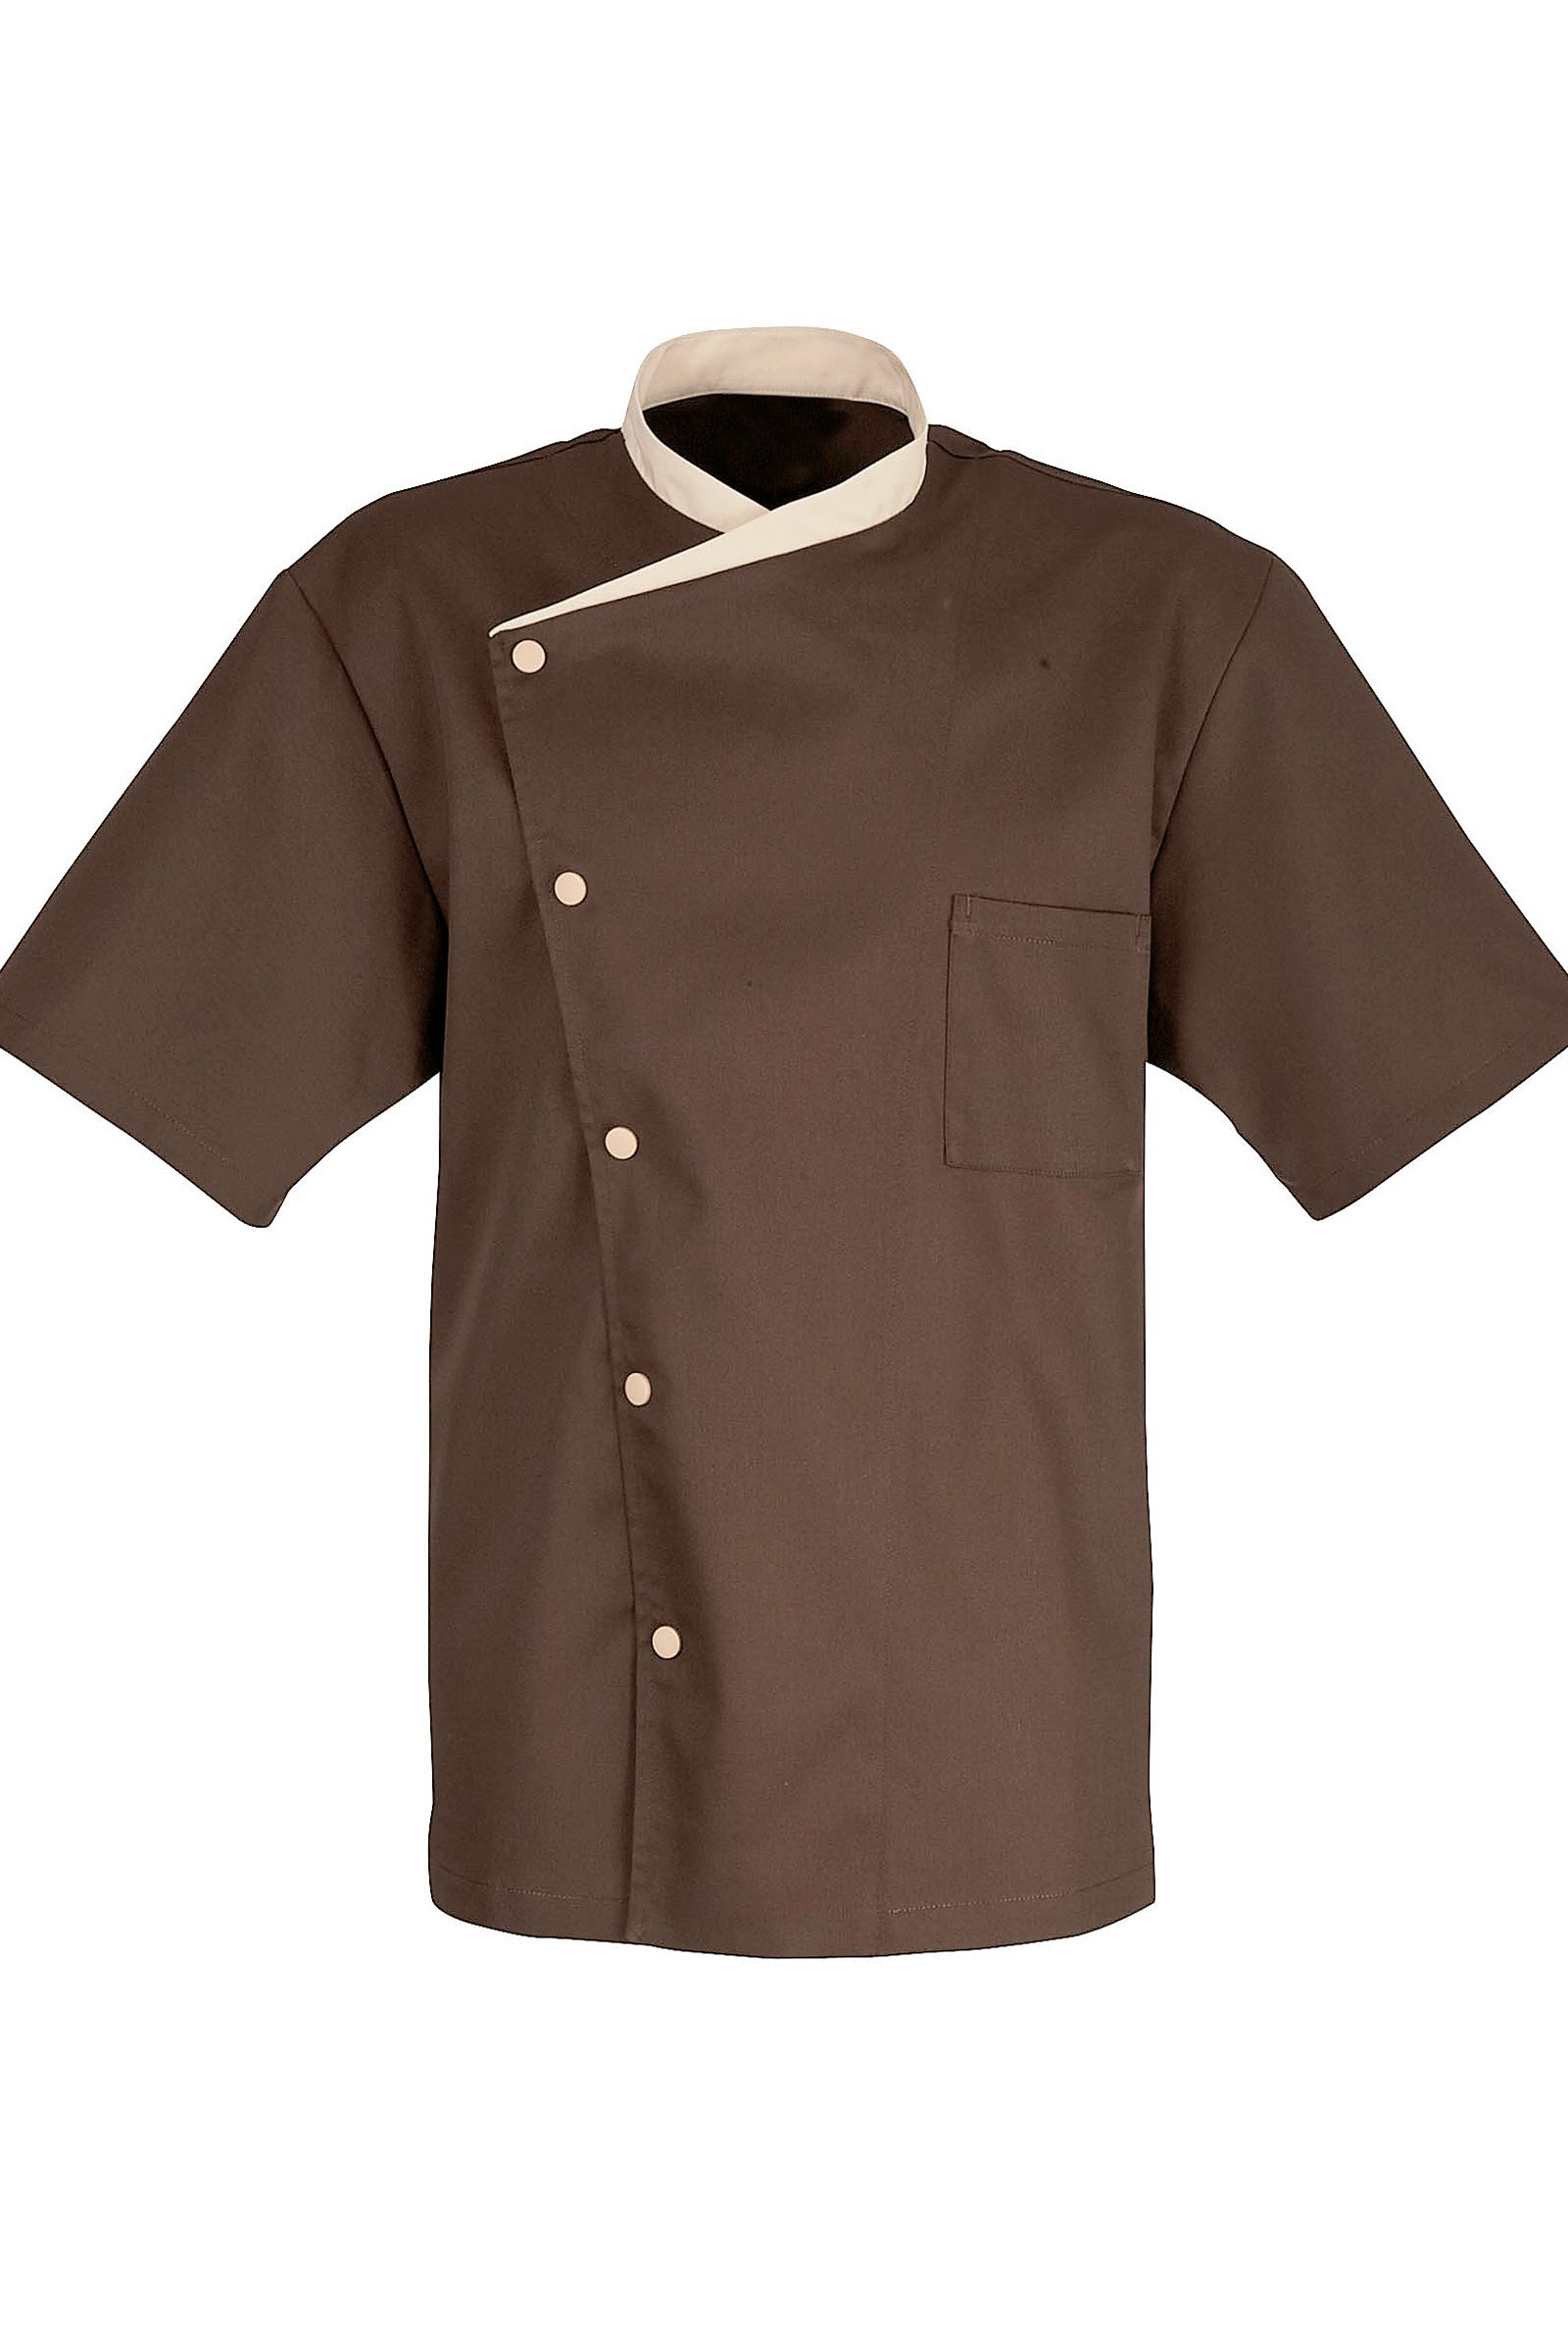 veste de cuisine en jeans,veste cuisine broderie,veste de cuisine ... - Broderie Veste De Cuisine